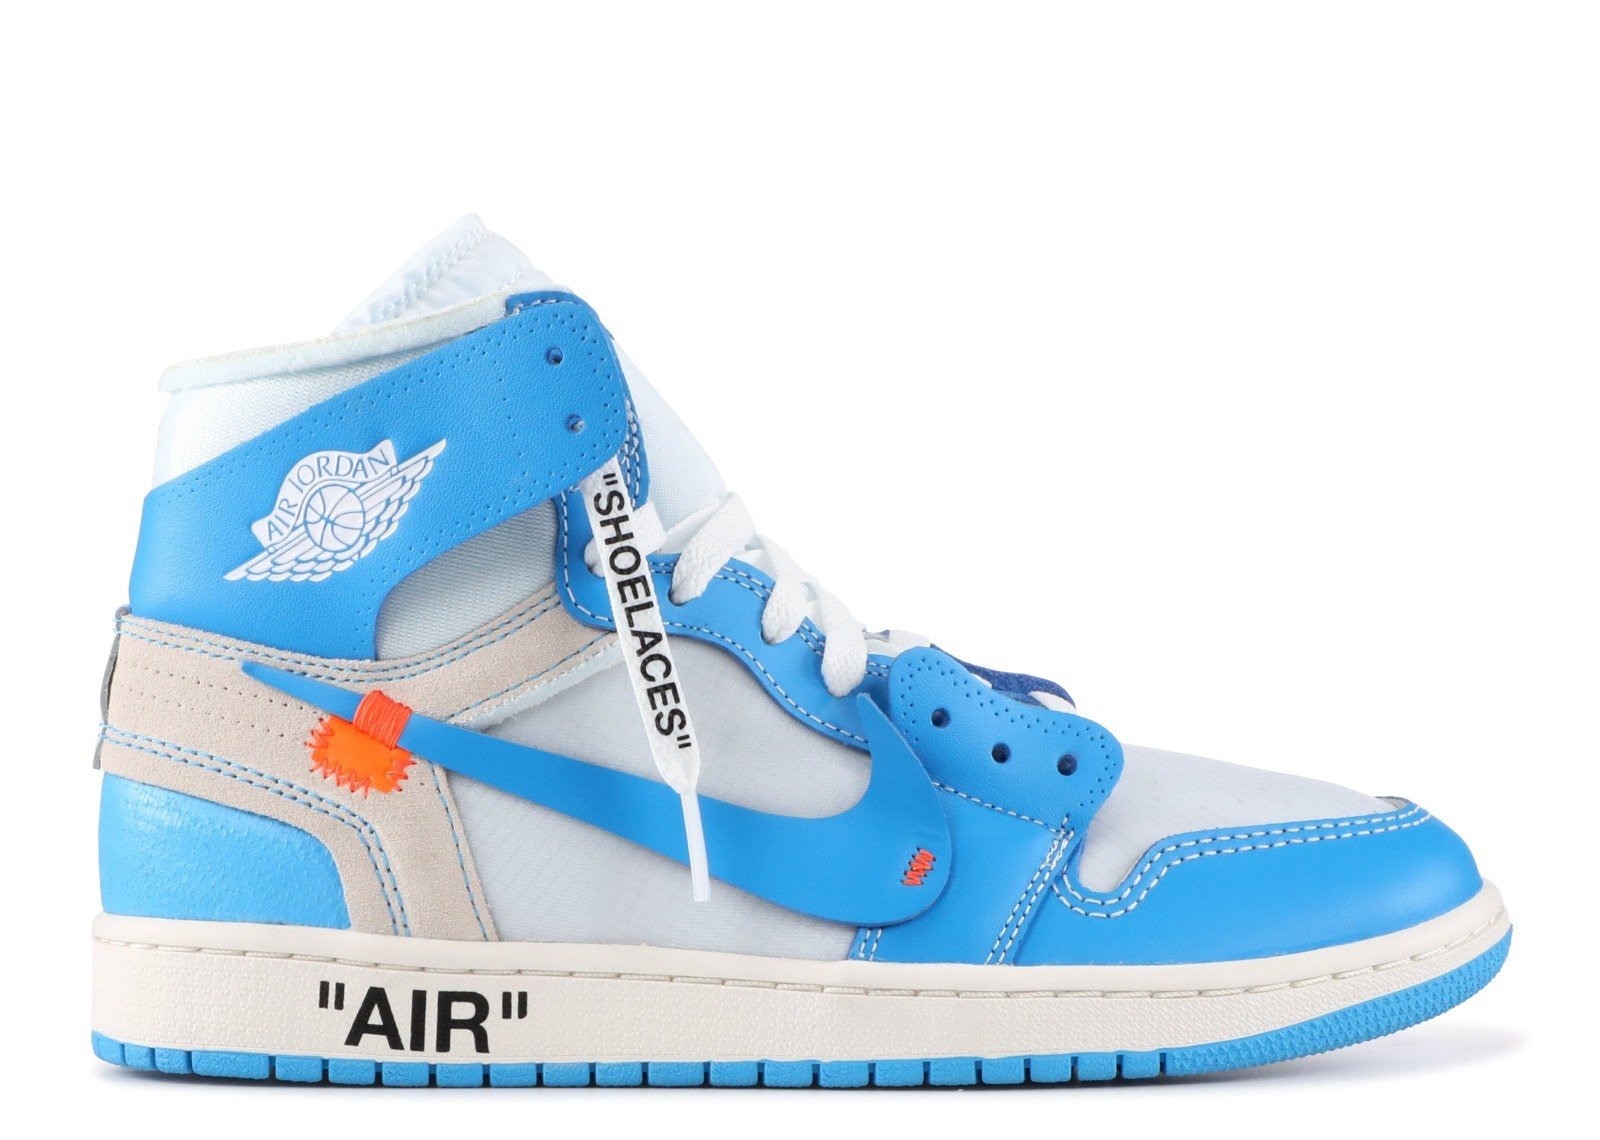 26fa995739e98c UA Air Jordan 1 X Off White University Blue for Sale